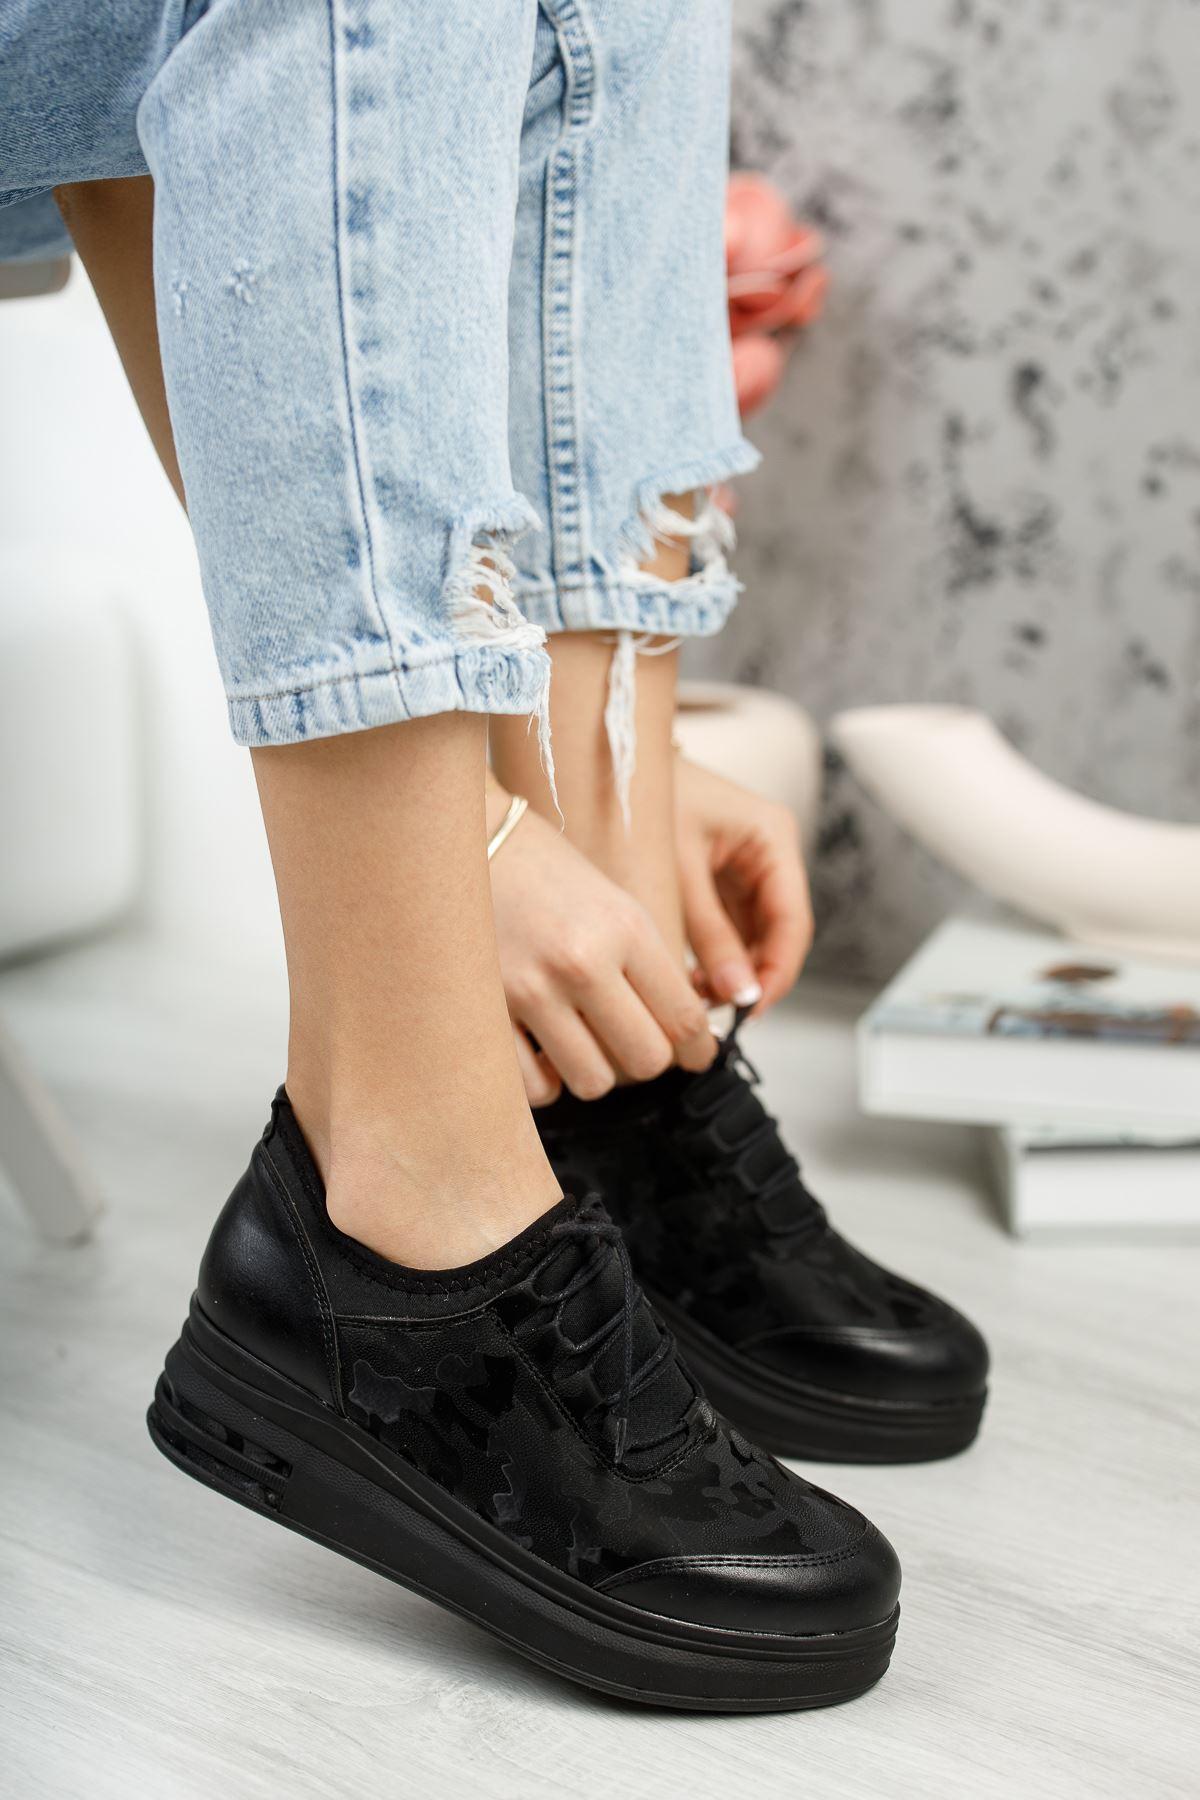 Zeytuni Siyah Ortapedik Siyah Taban  Siyah Desenli Bayan Spor Ayakkabı